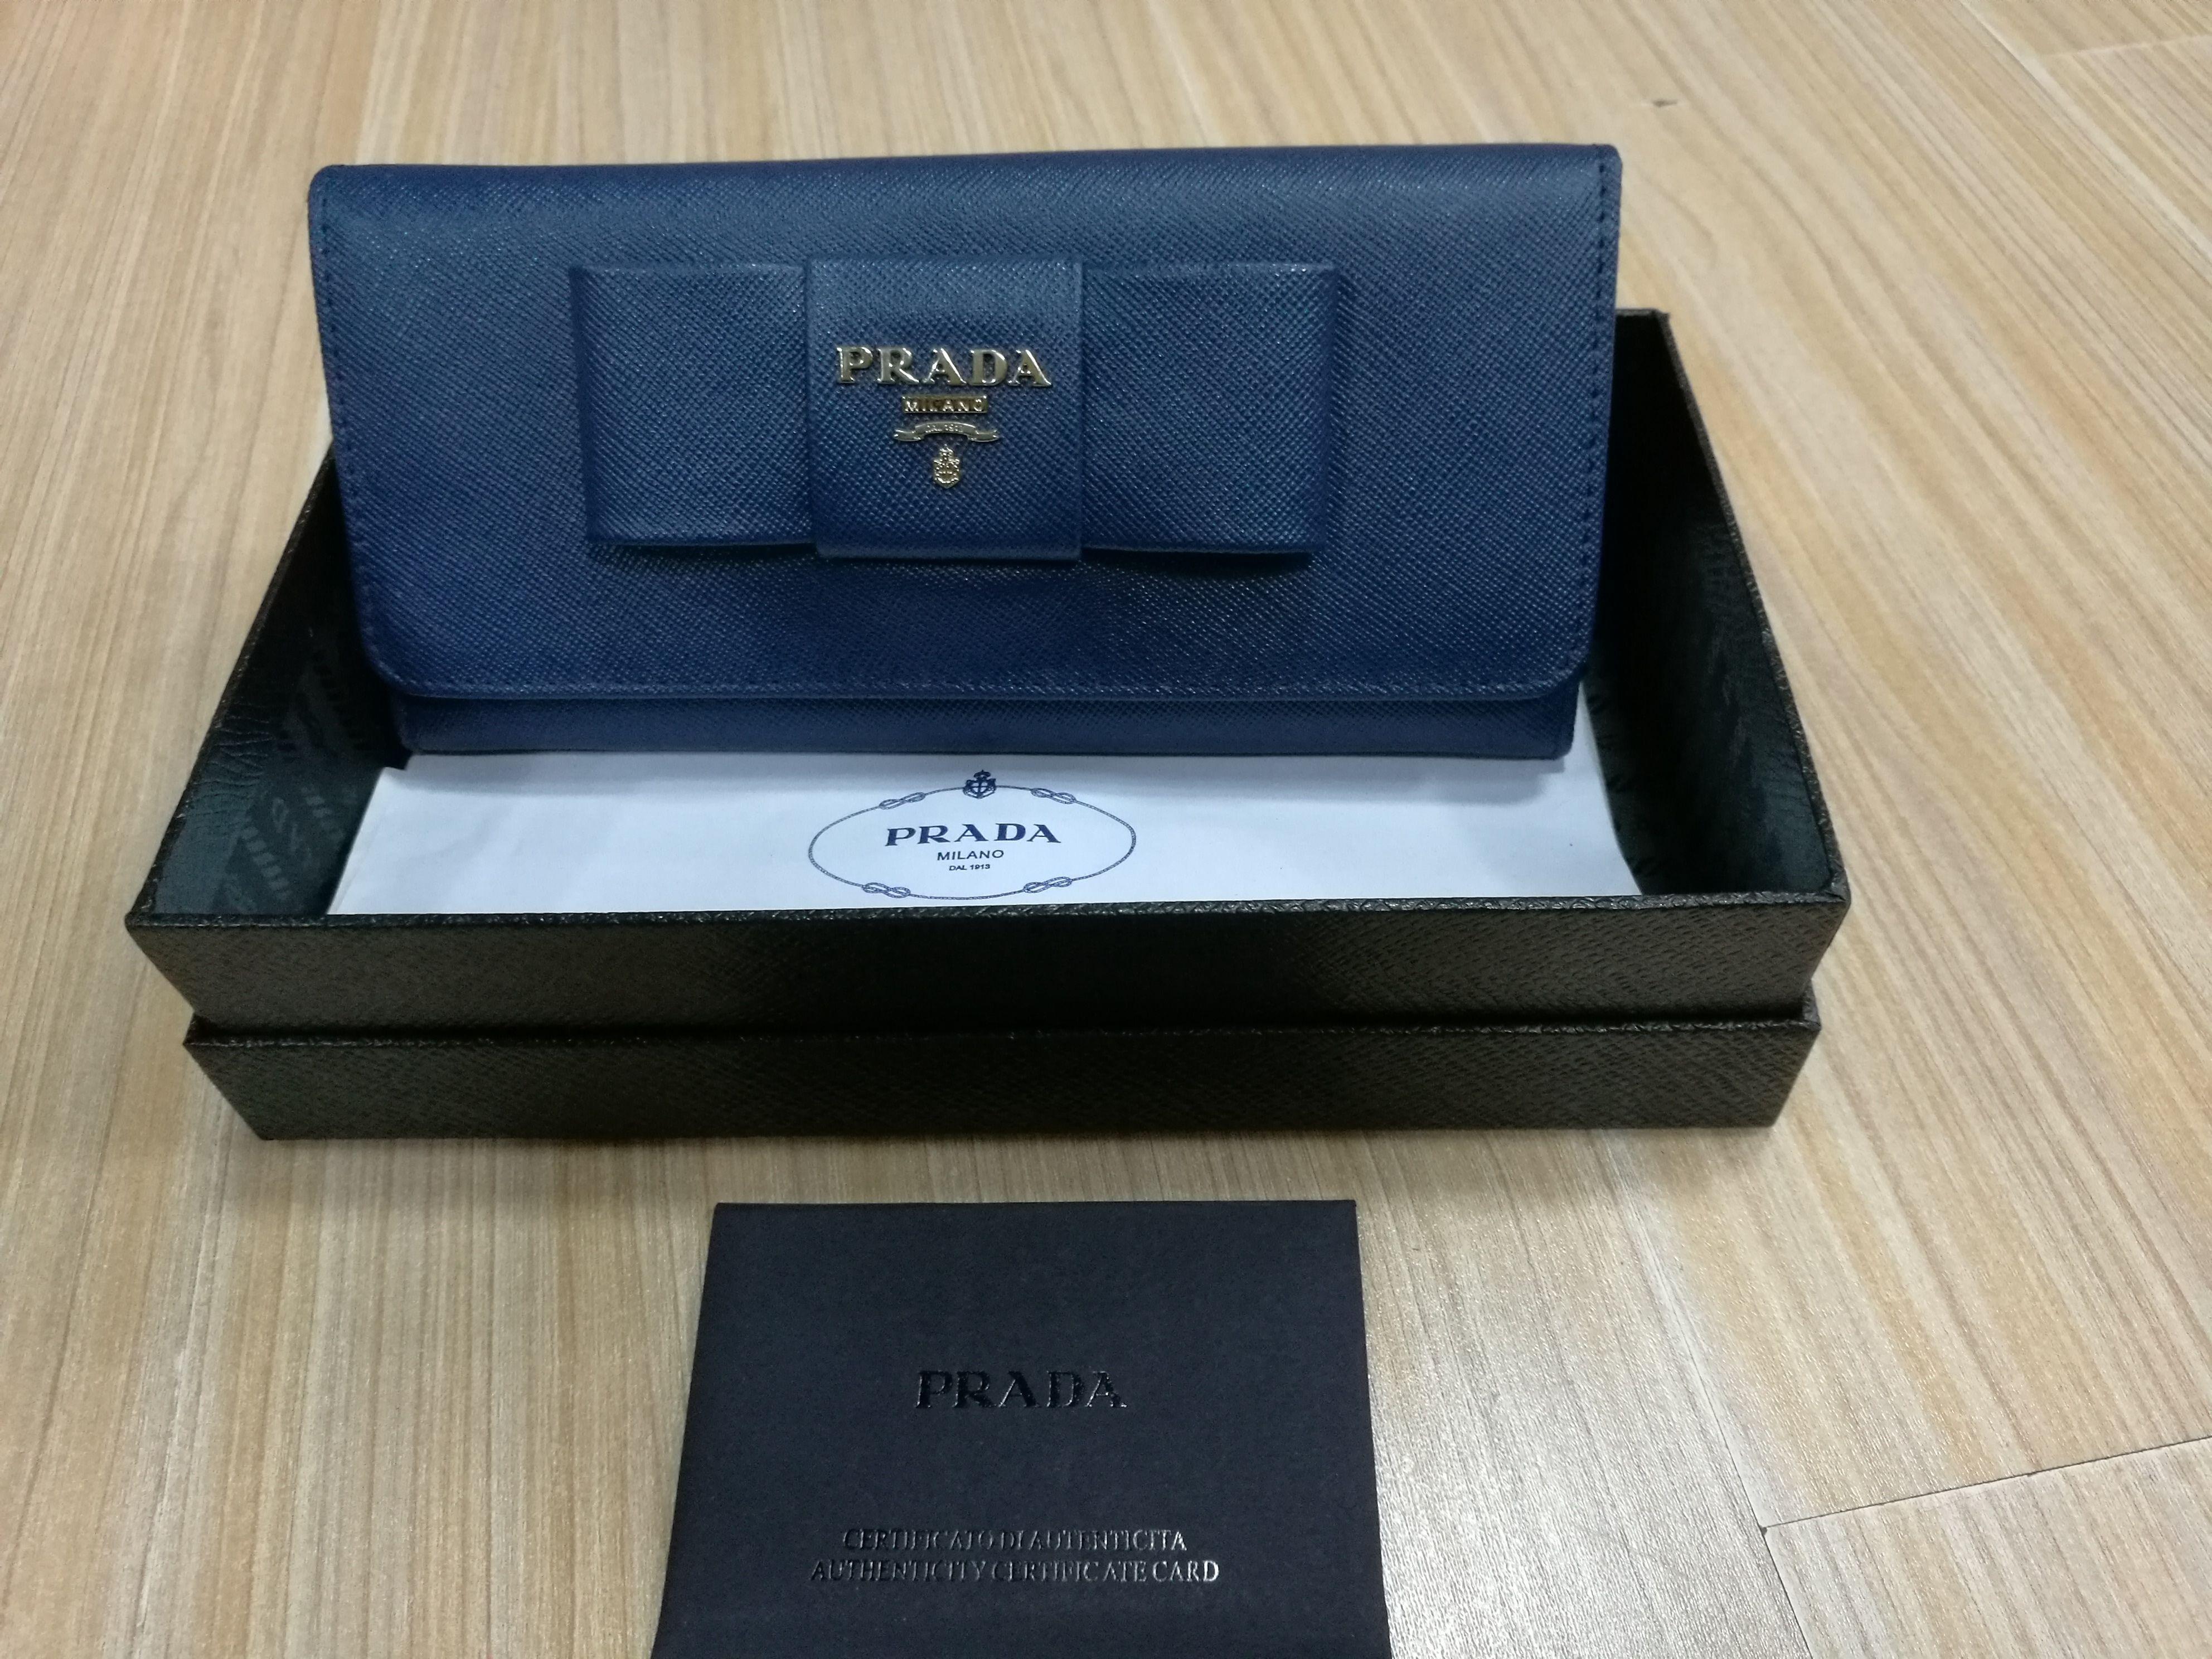 G-18 ?【超高級ブランド】PRADA プラダ 長財布